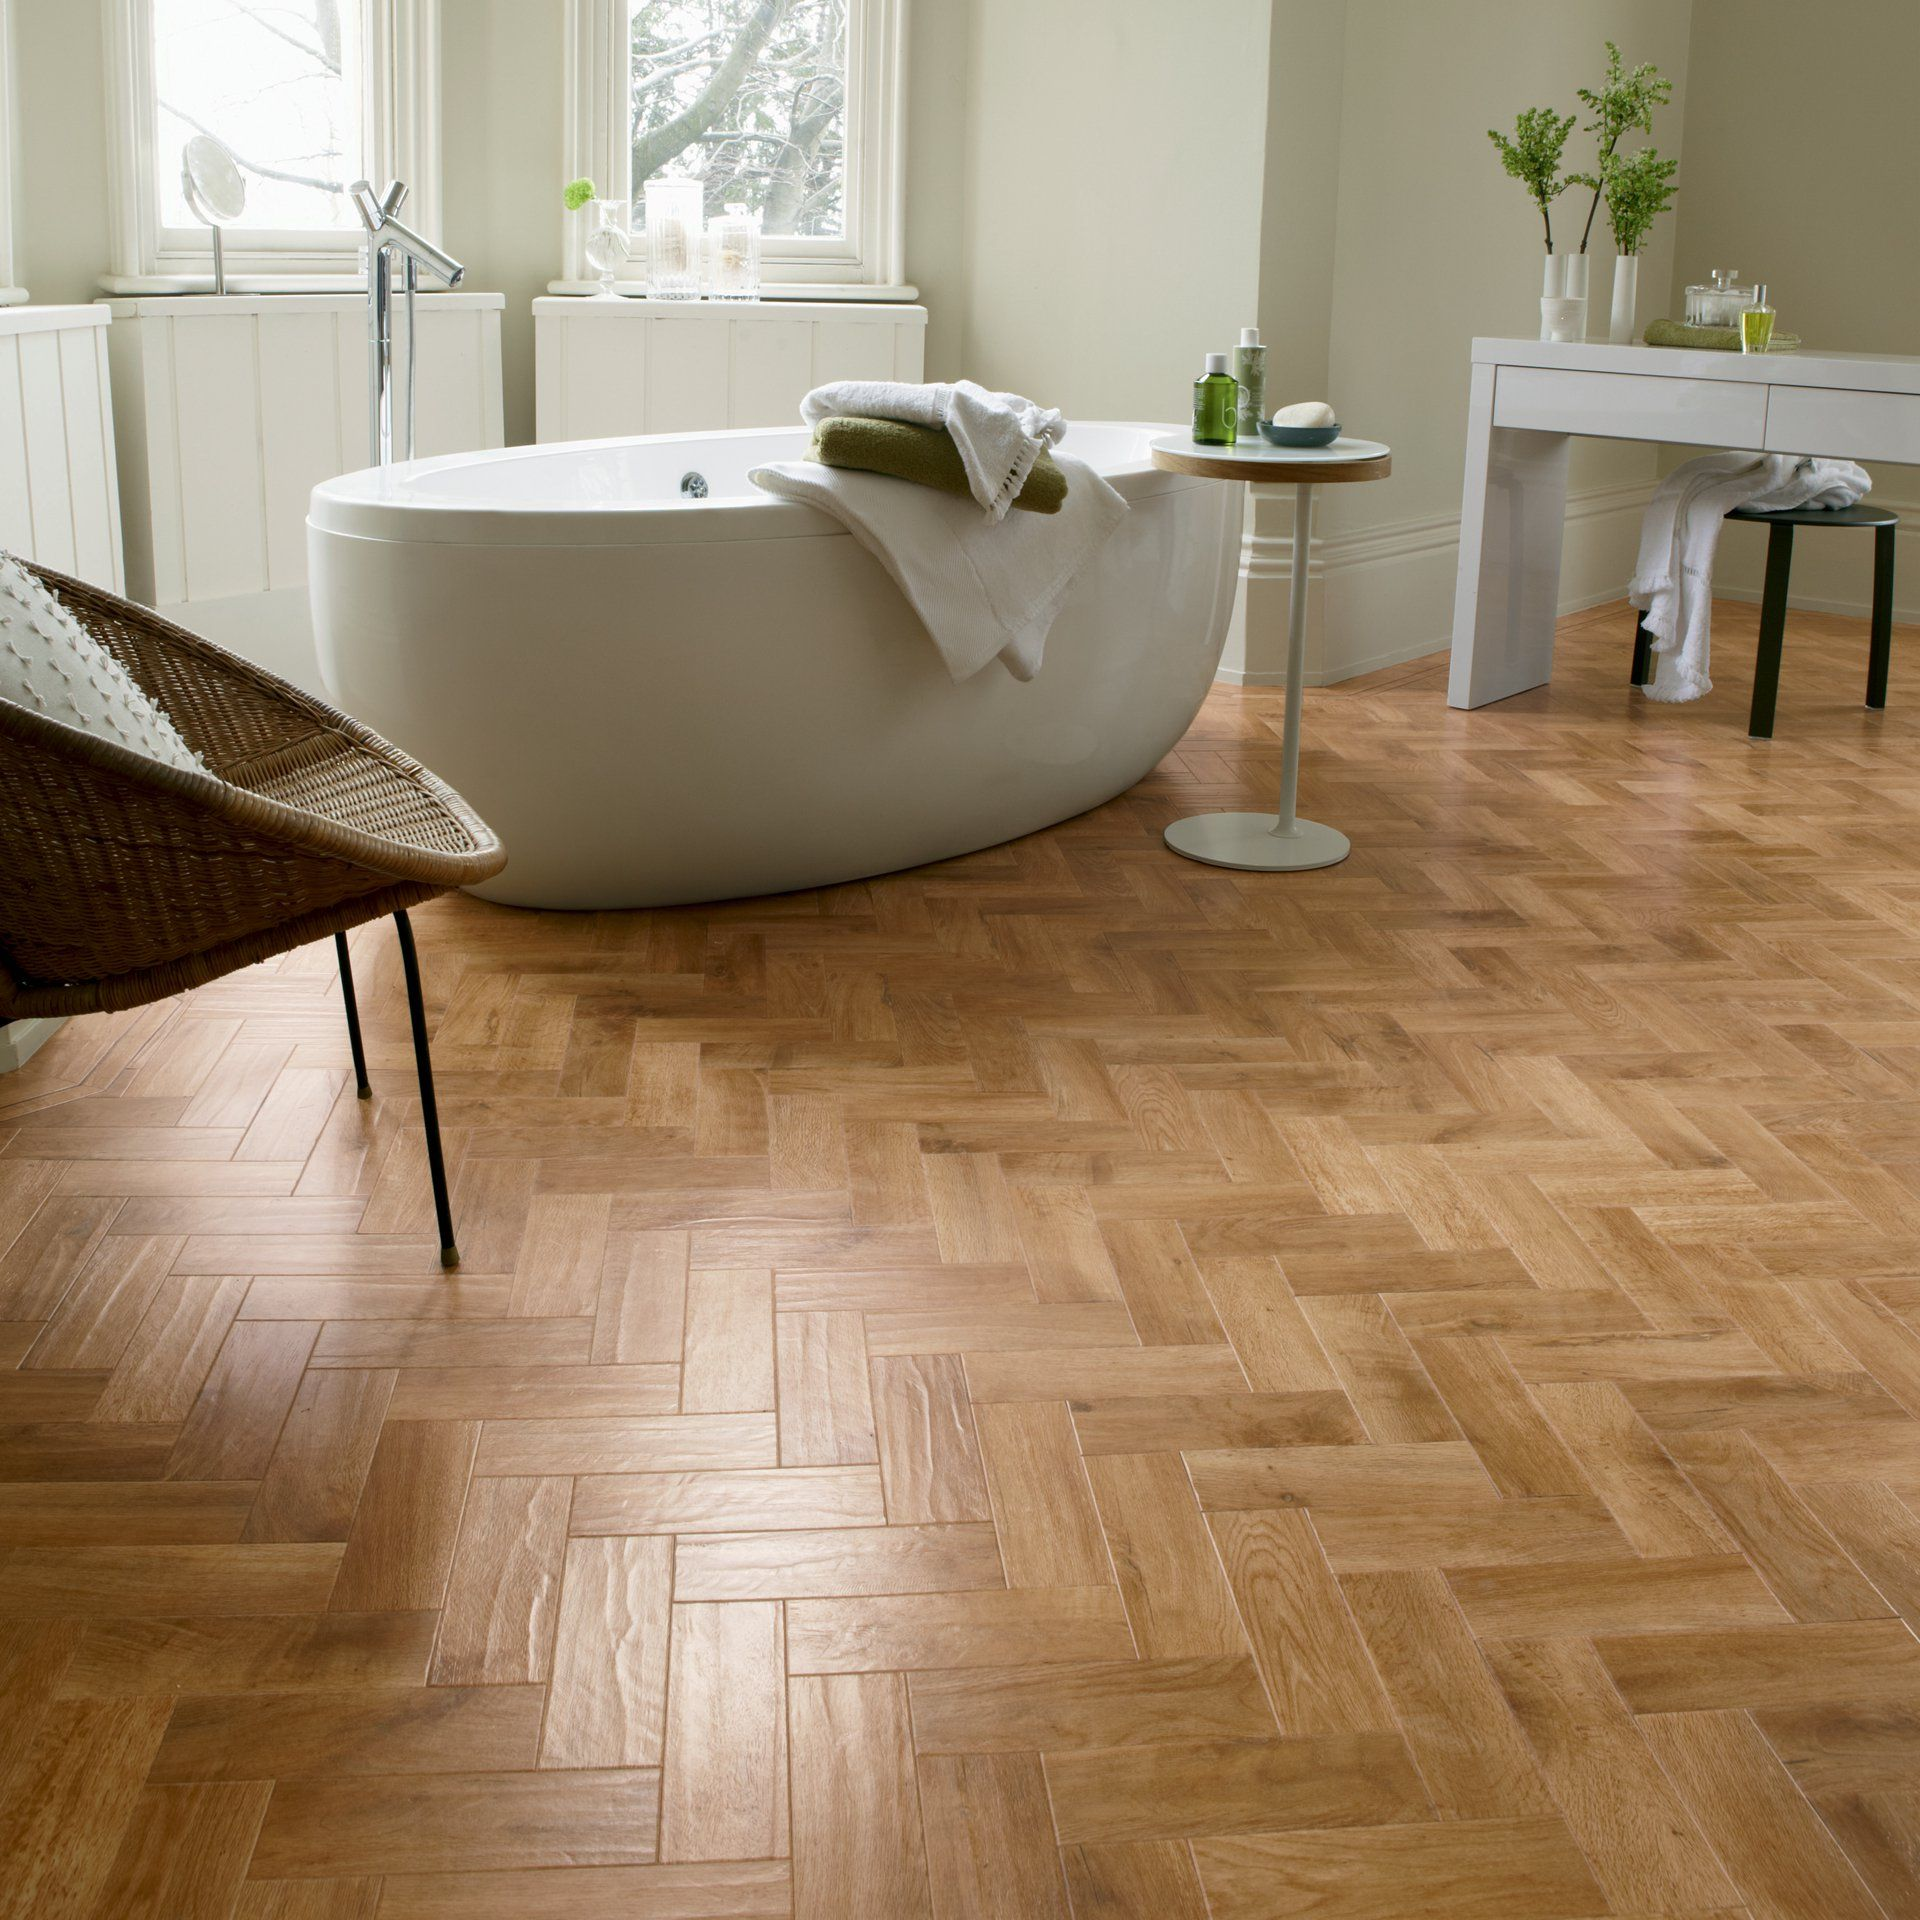 Bathroom Flooring Ideas For Your Home Karndean New Zealand Karndean Flooring Parkay Flooring Oak Parquet Flooring